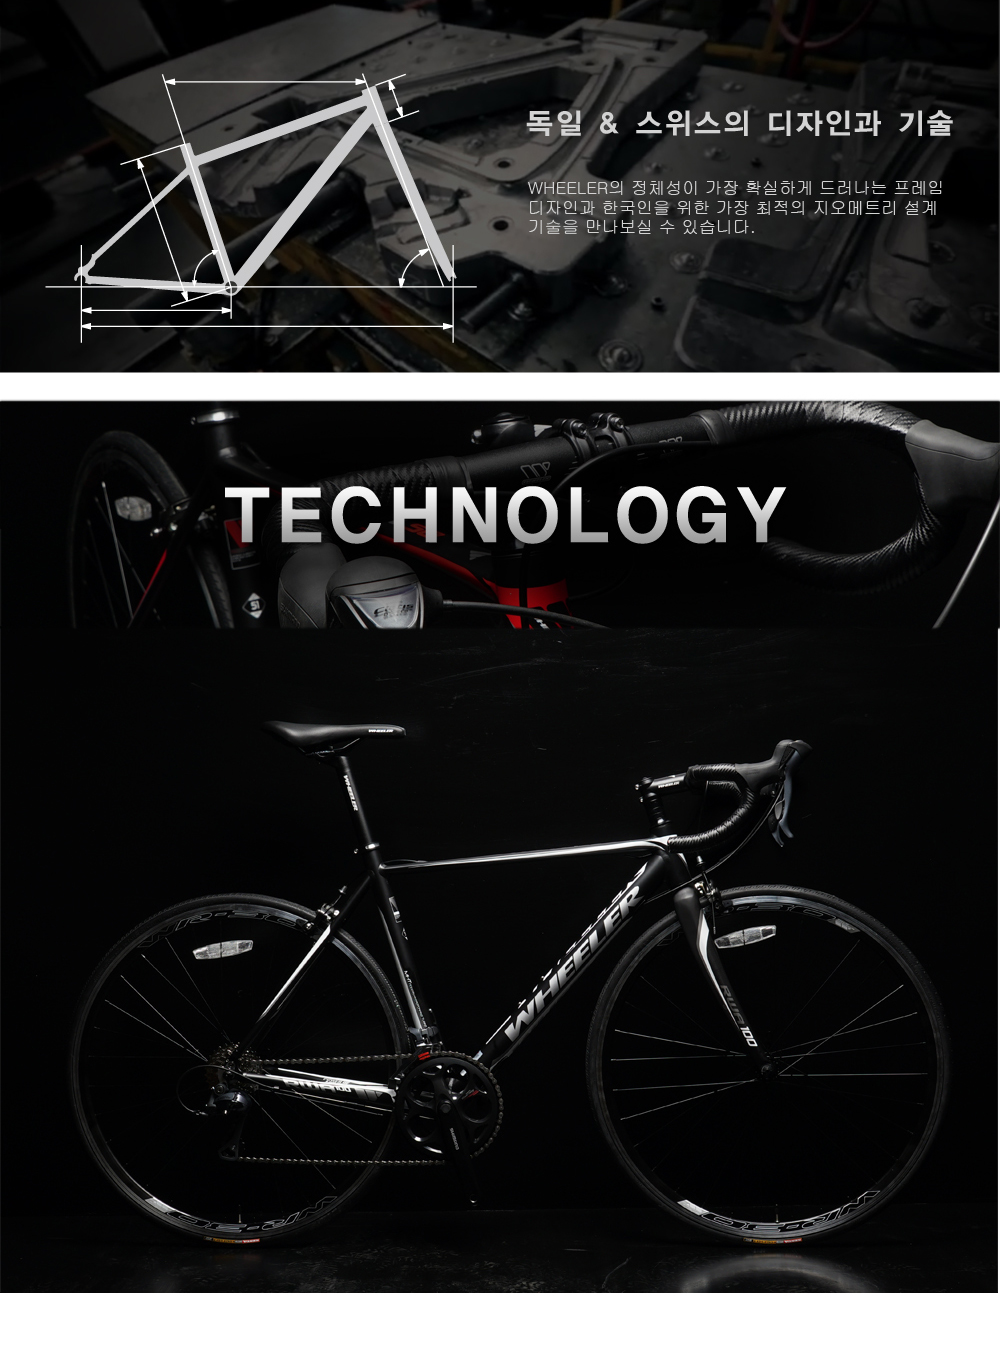 http://www.bikesin.co.kr/shop/se2/imgup/20160216121708.9800.7.2